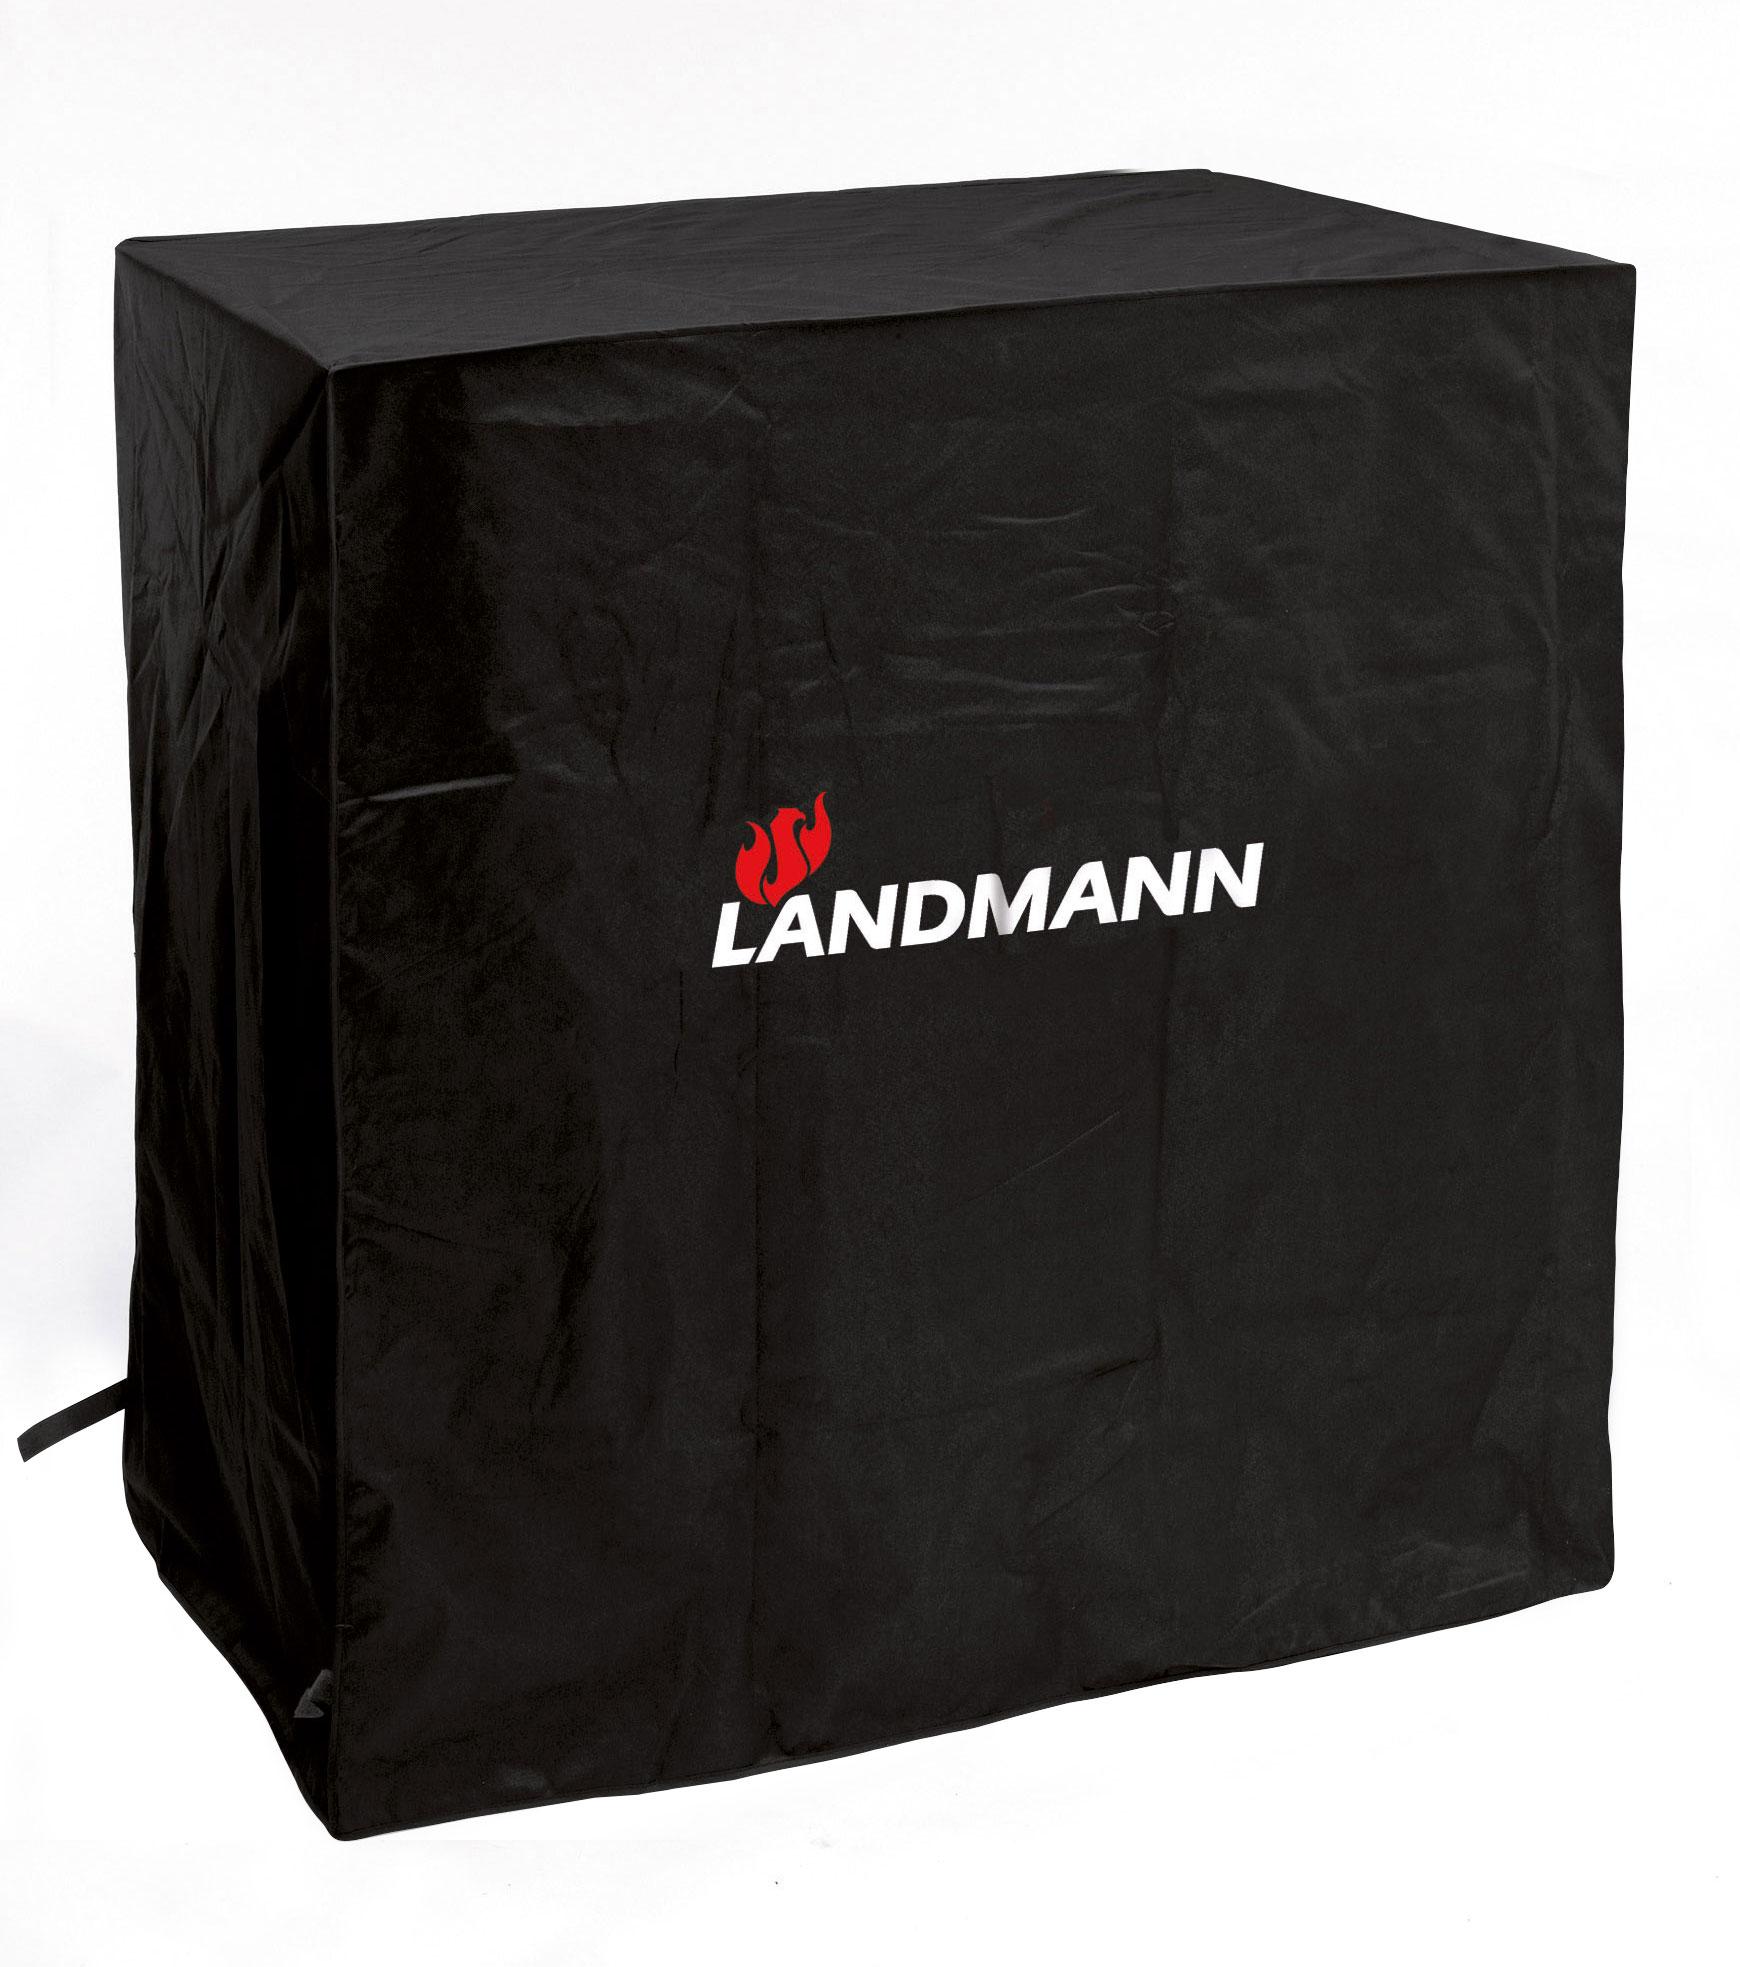 schutzh lle f r landmann grill wetterschutzhaube quality m. Black Bedroom Furniture Sets. Home Design Ideas